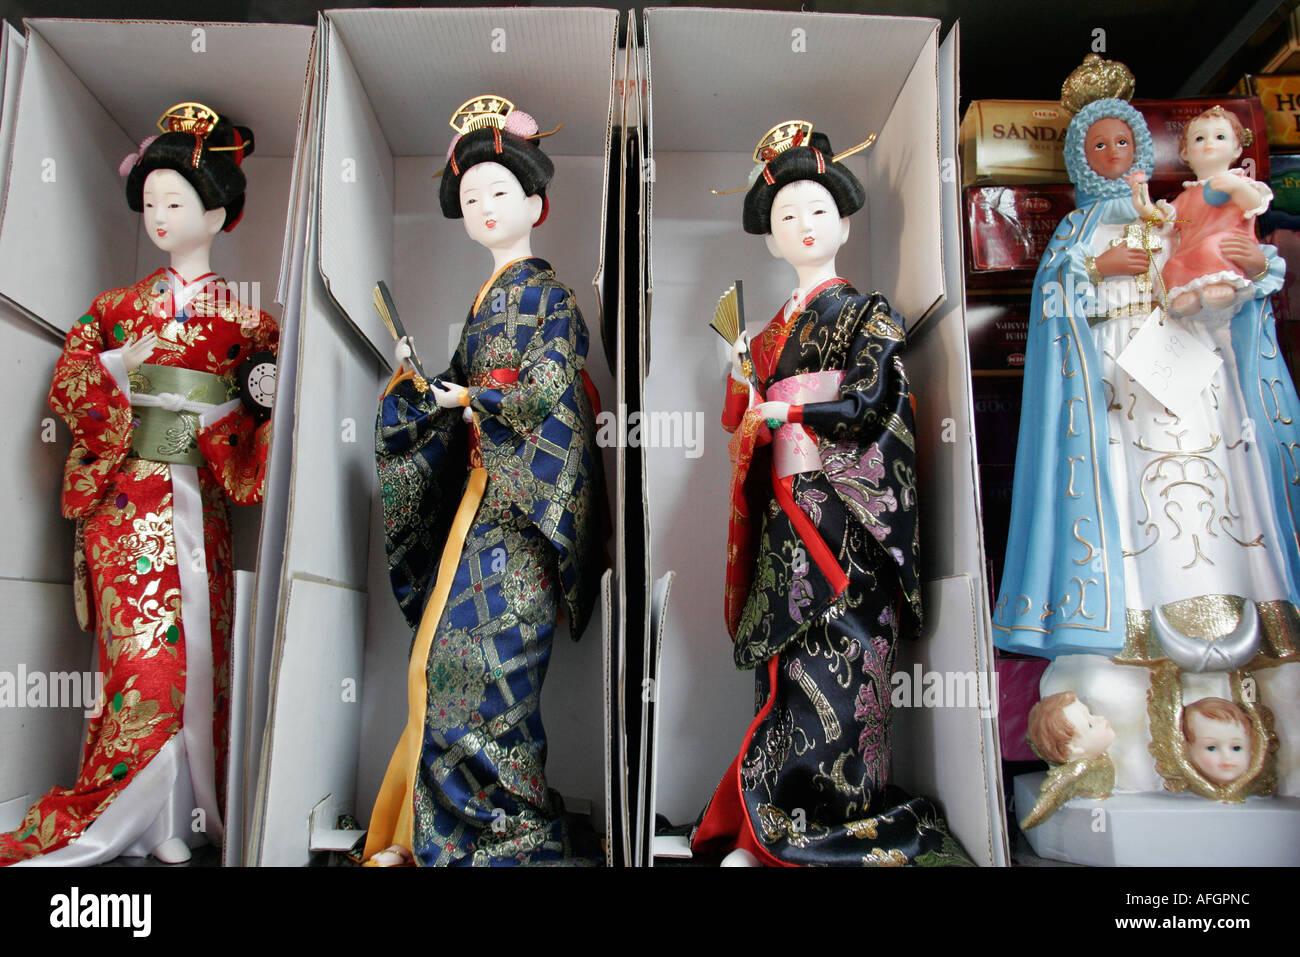 Miami Florida Little Havana Calle Ocho new age store Spanish language Chinese dolls Christian statuette - Stock Image